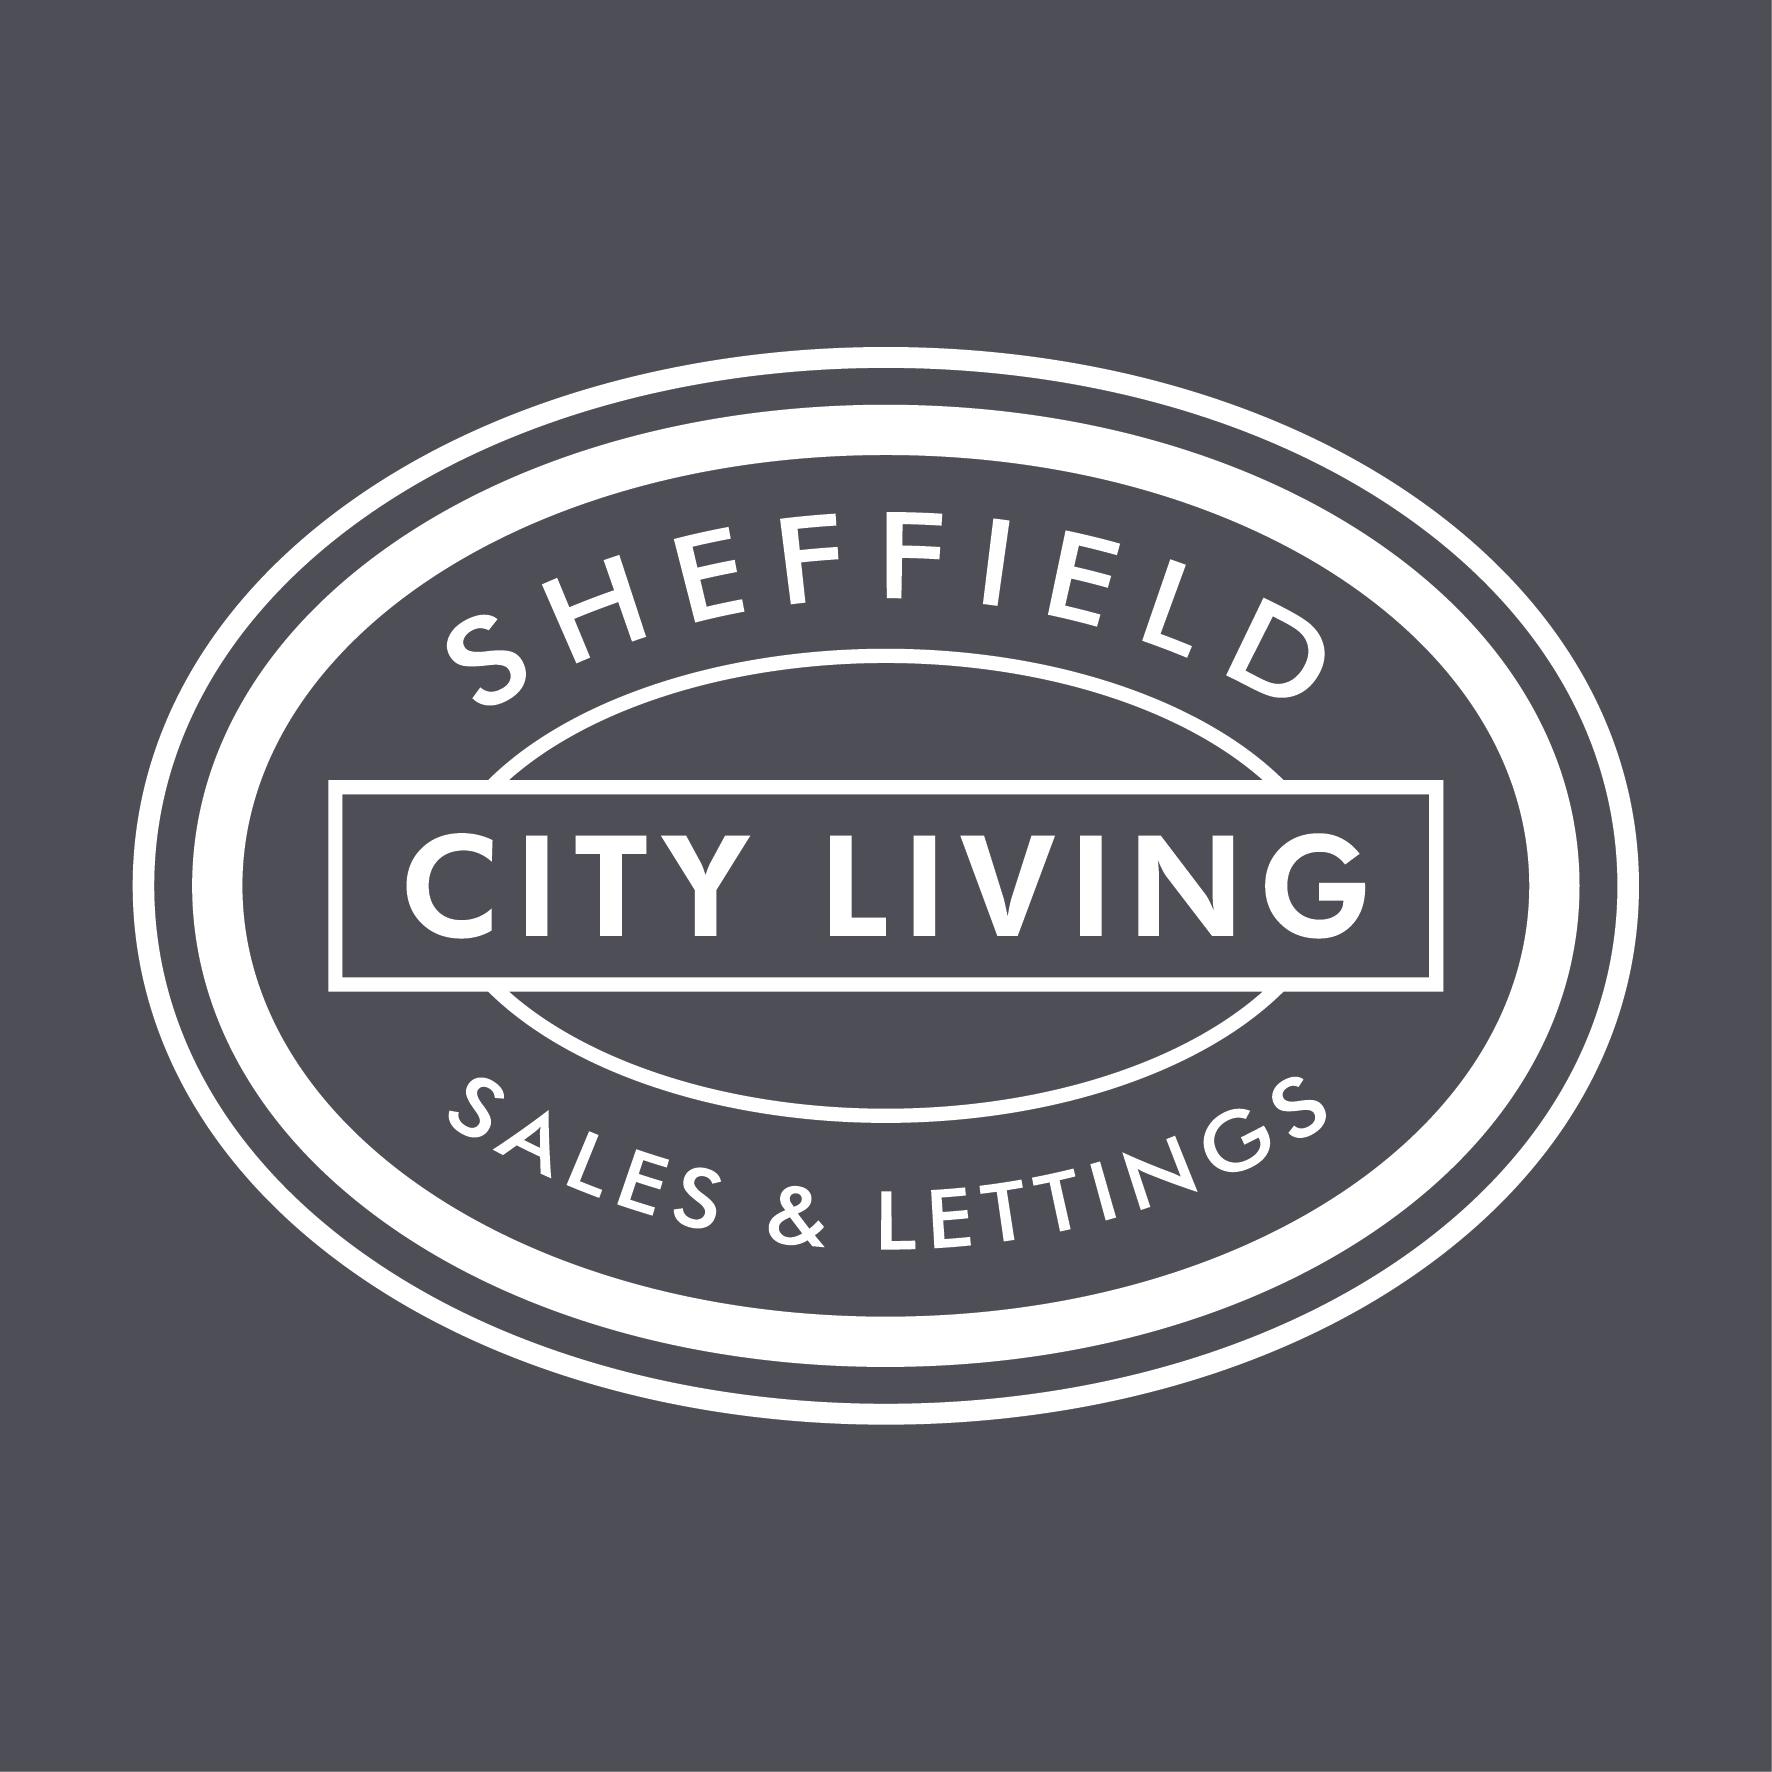 Sheffield City Living